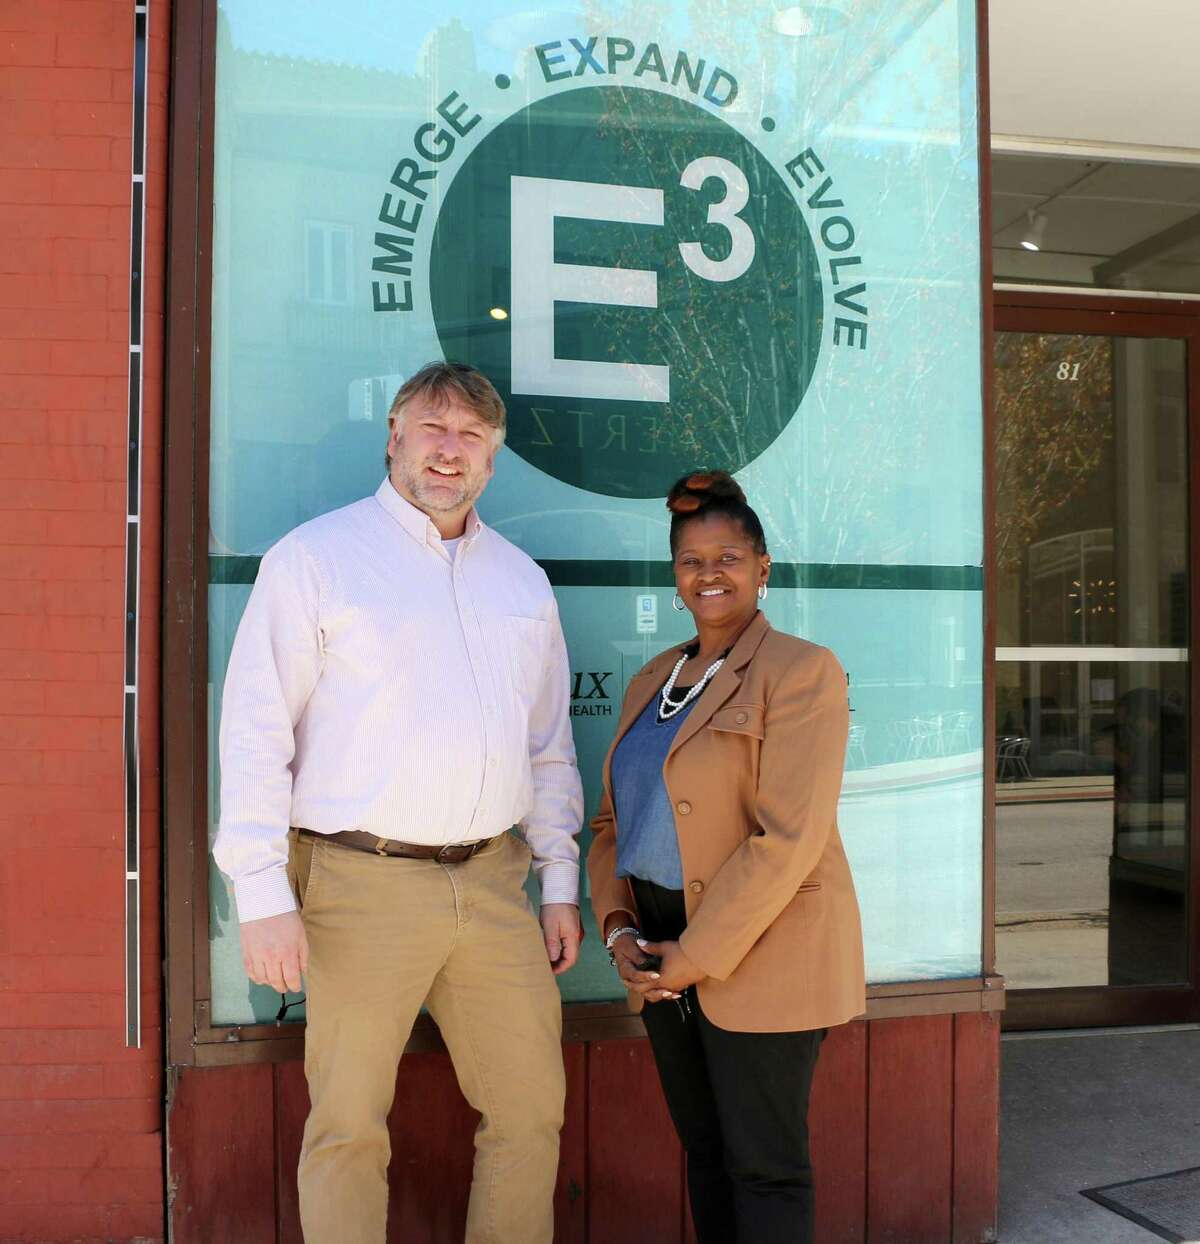 Sean Kavanaugh and Regina Long, new program leaders at the E3 Transition program.